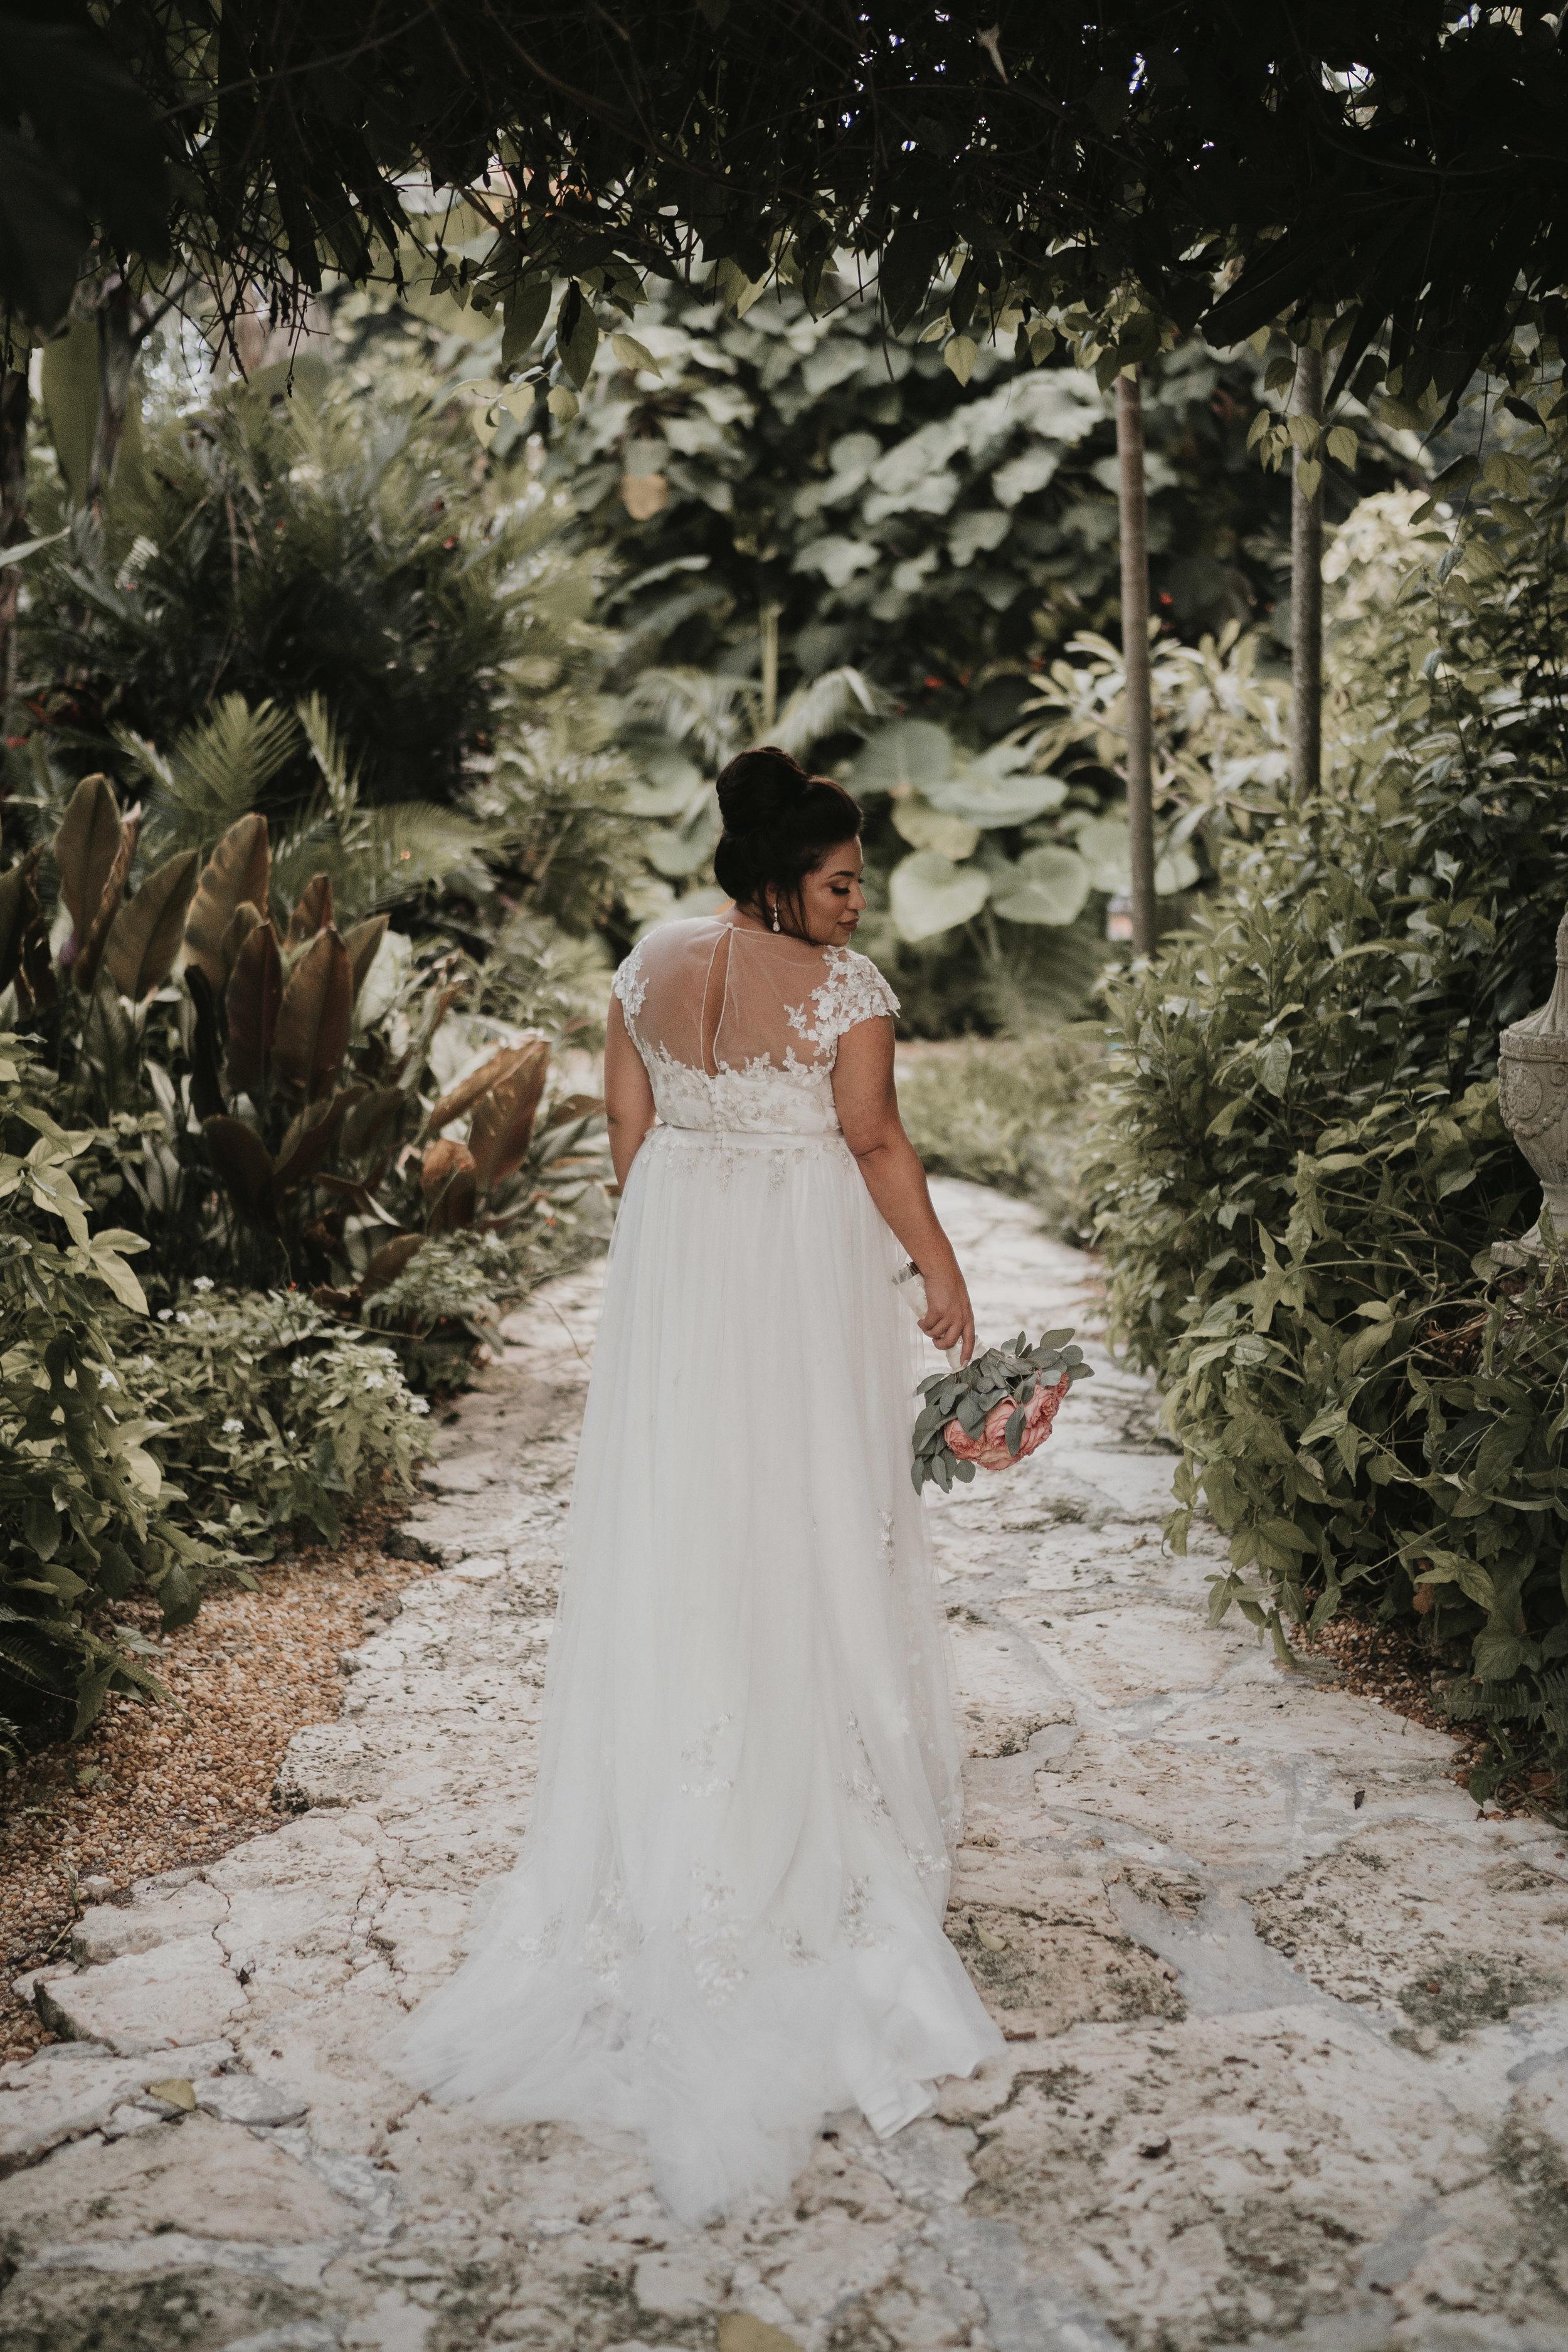 362MICHI&GABEWEDDINGDAY(WeddingFinal).jpg